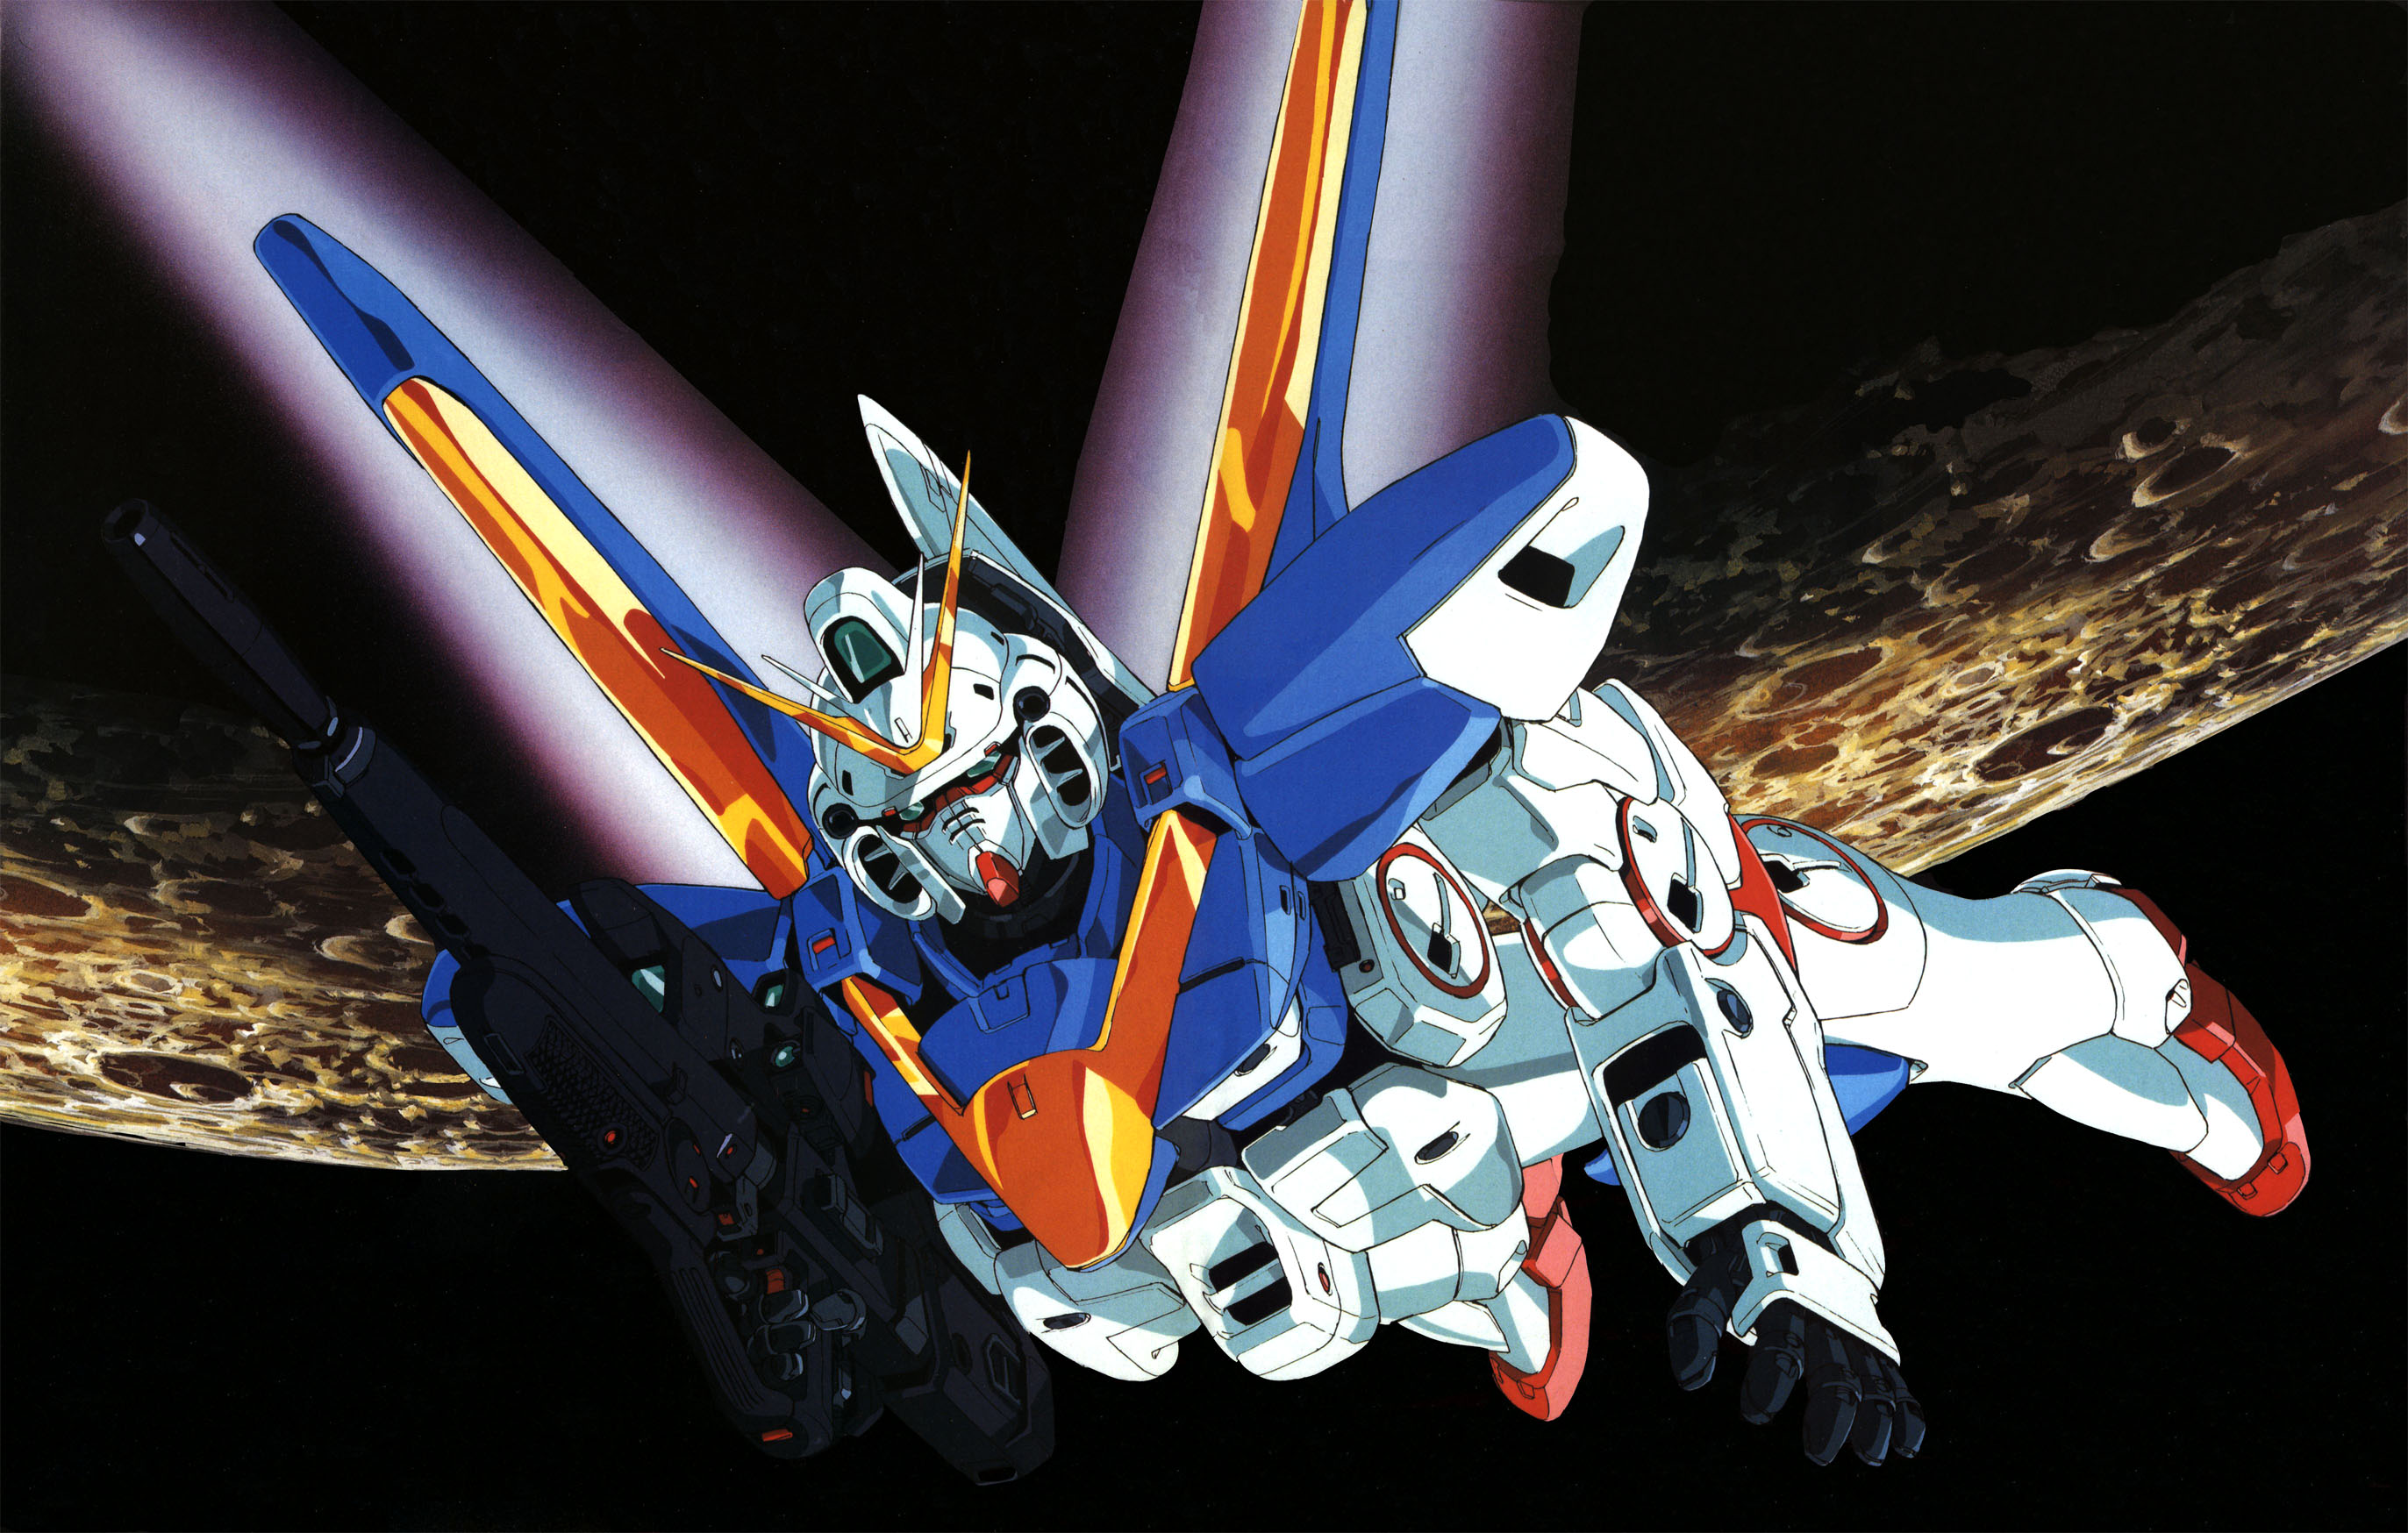 Mobile Suit Gundam Wing wallpaper   ForWallpapercom 2745x1748